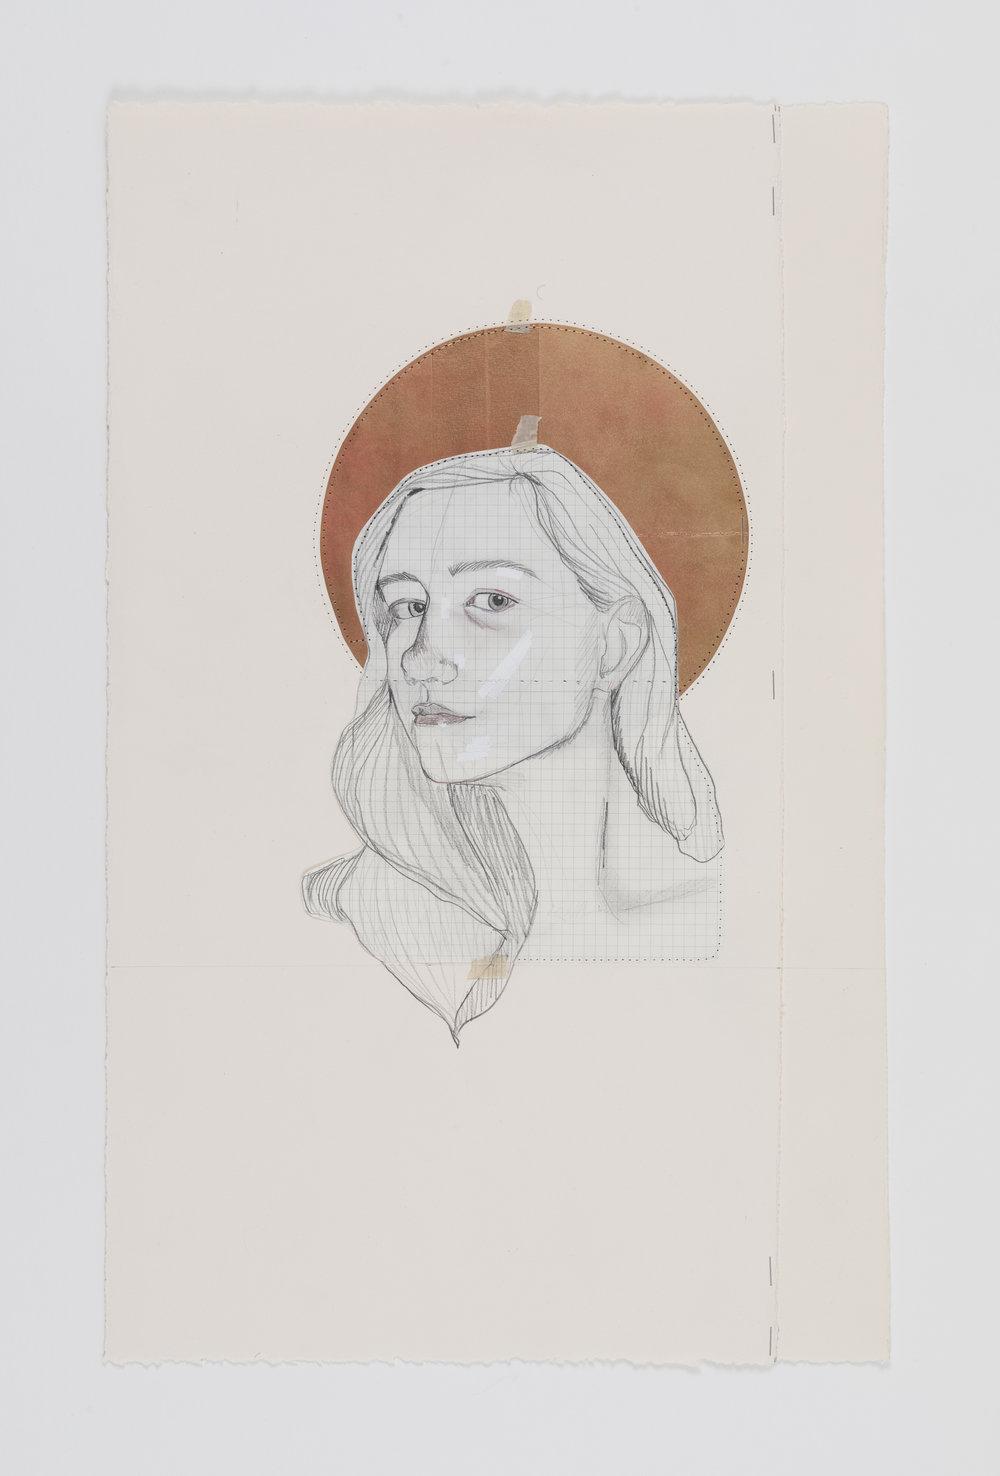 Self Portrait , Mixed Media on Paper, 23x14, 2018